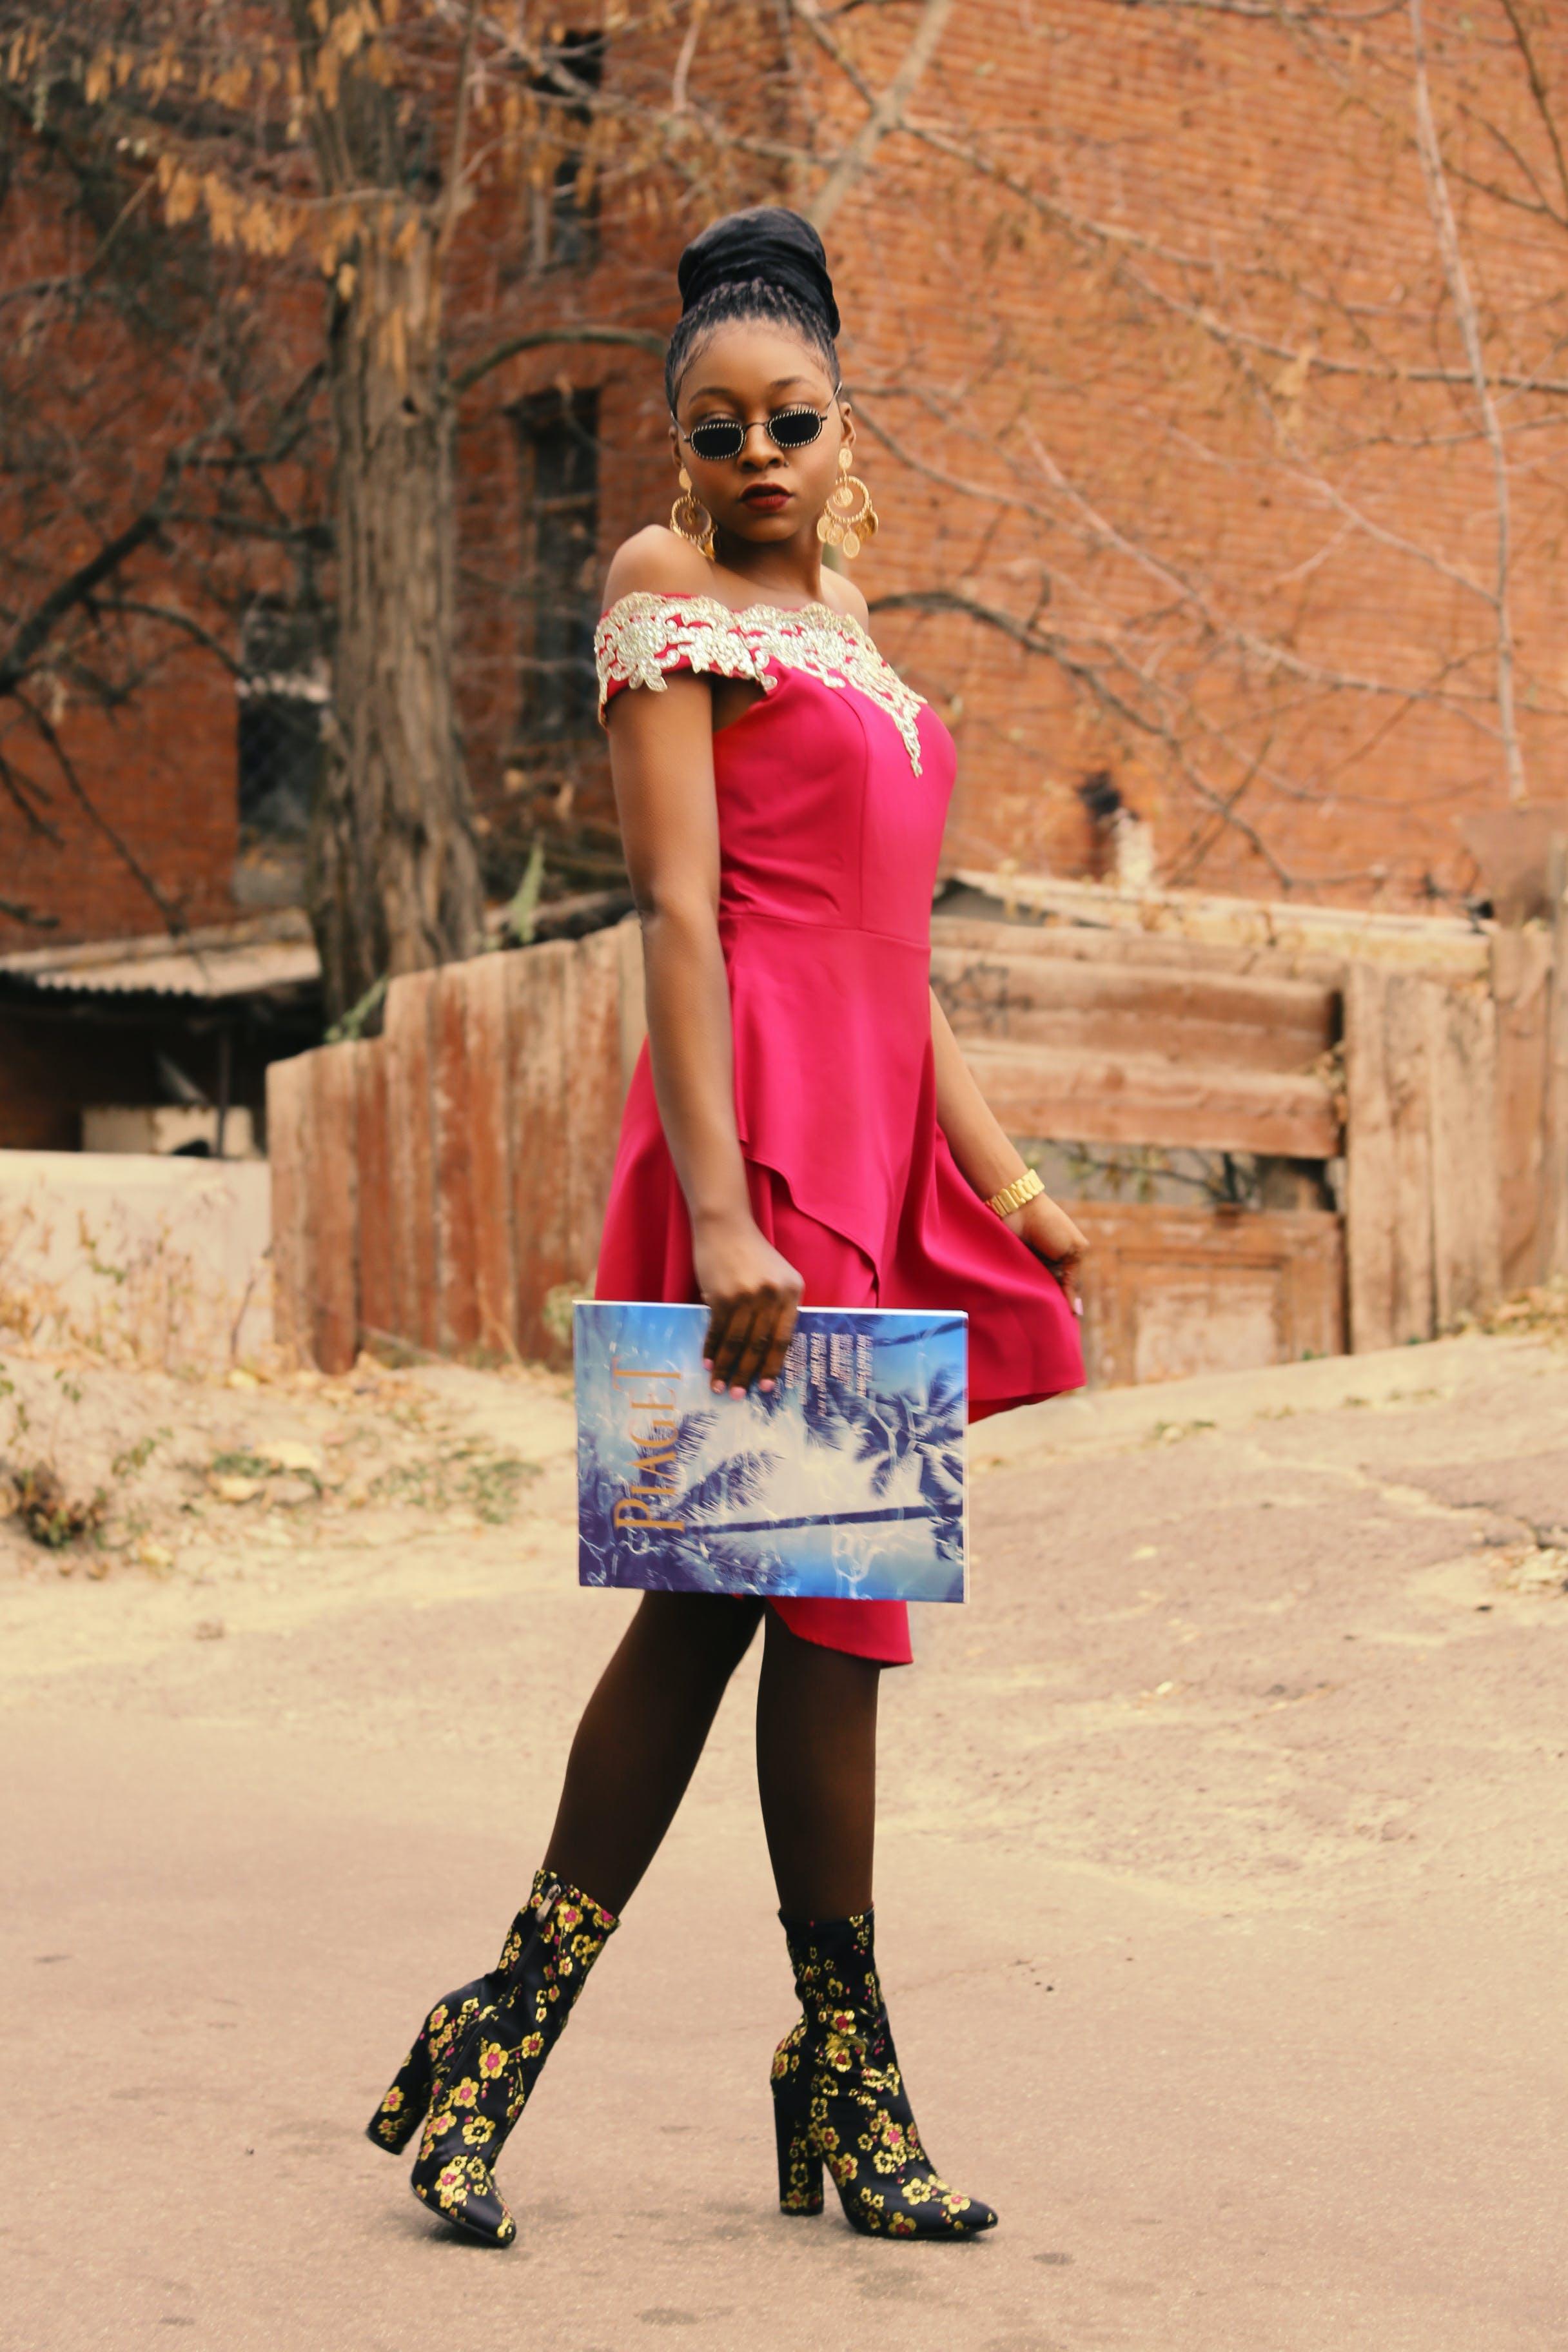 Kostenloses Stock Foto zu draußen, earings, farbige frau, fashion